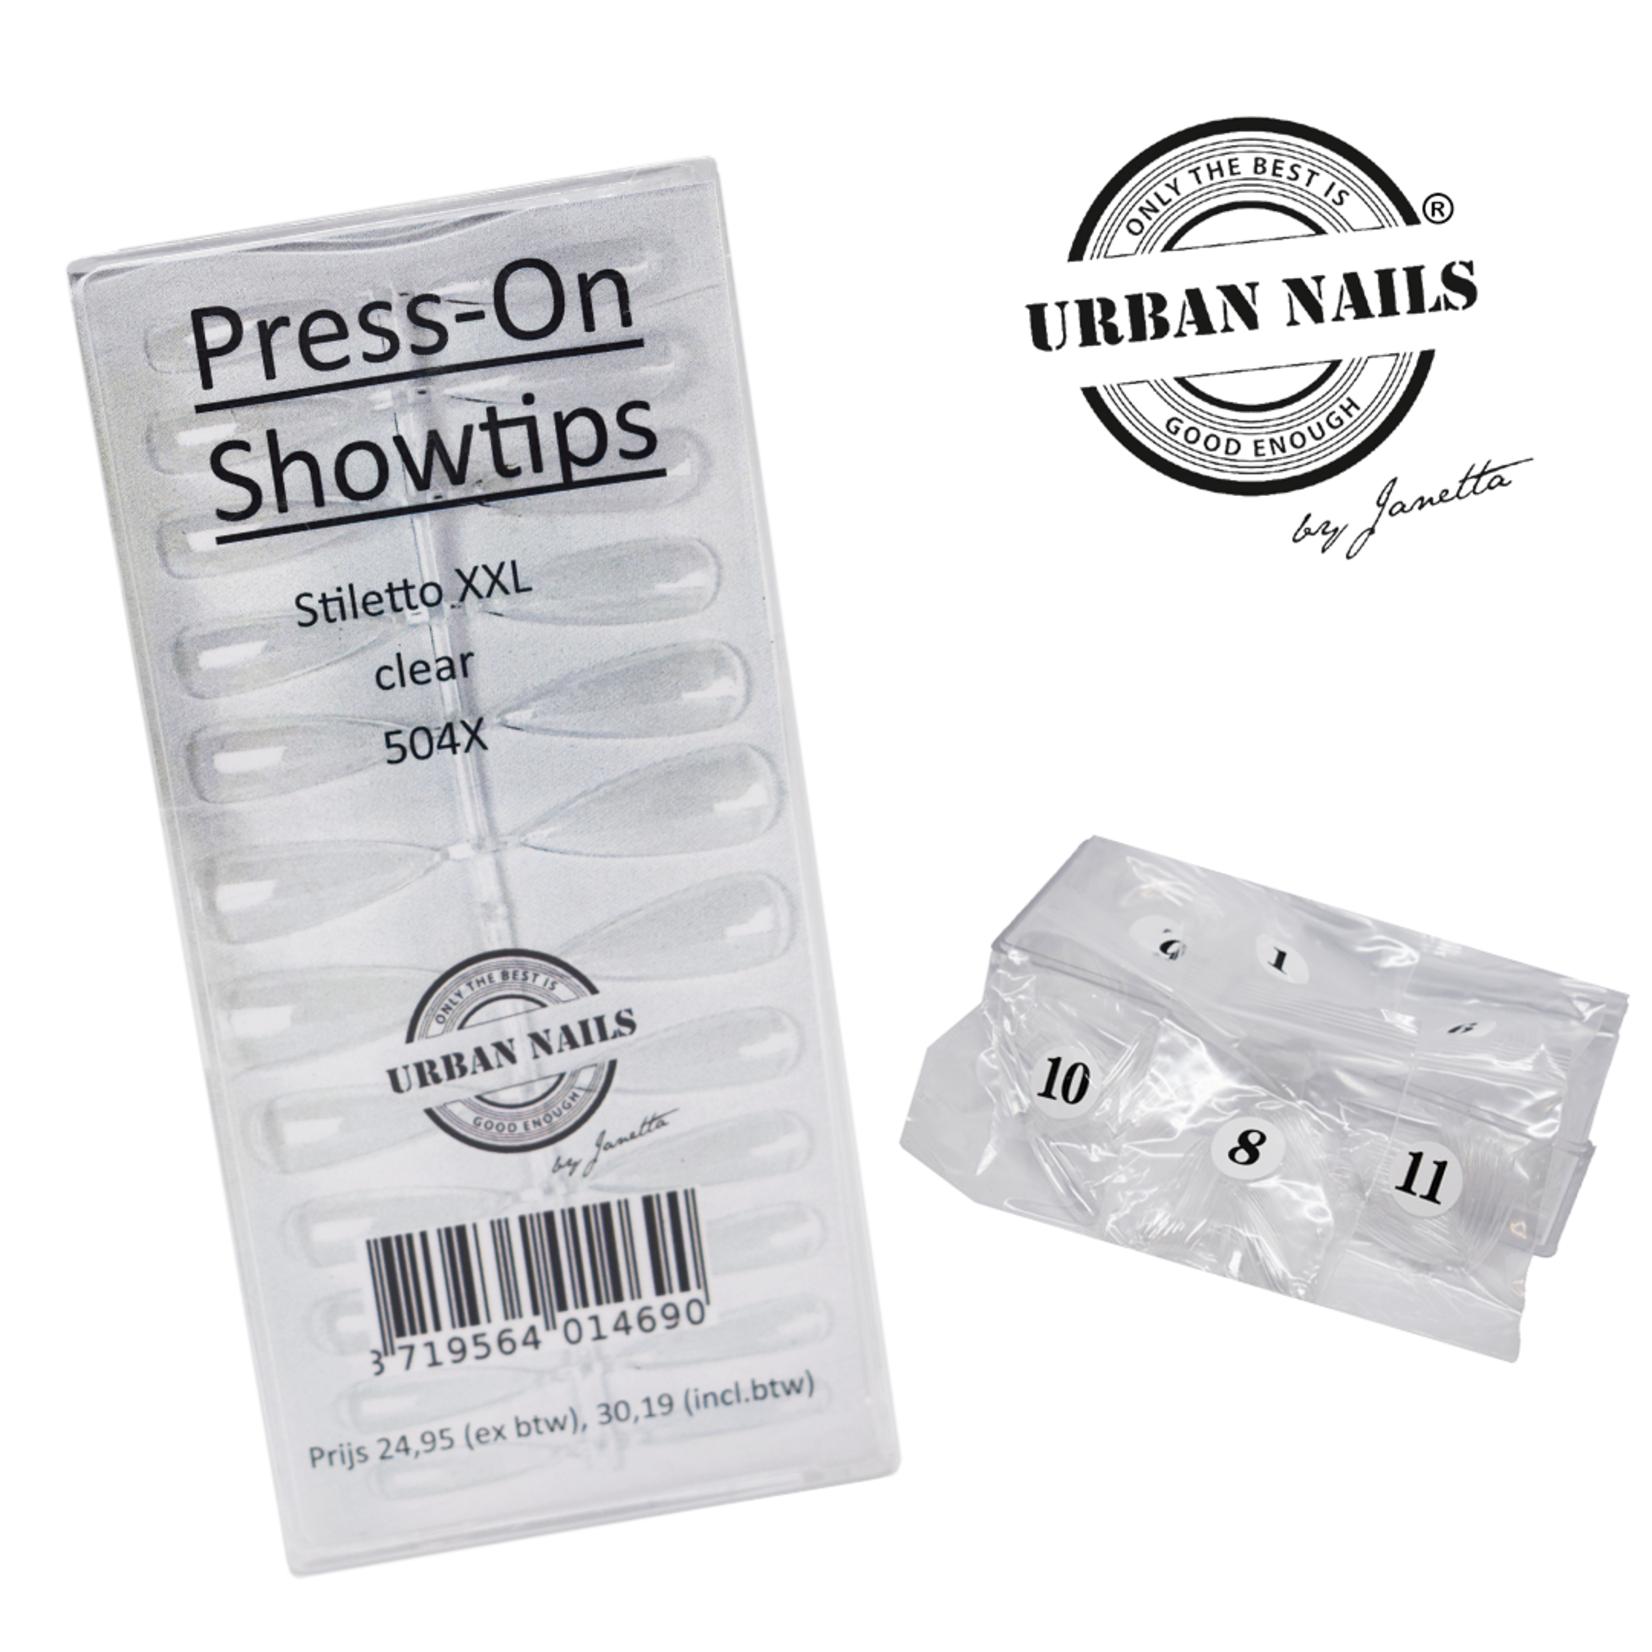 Urban Nails Press On Tips Stiletto XXL Box 504 stuks